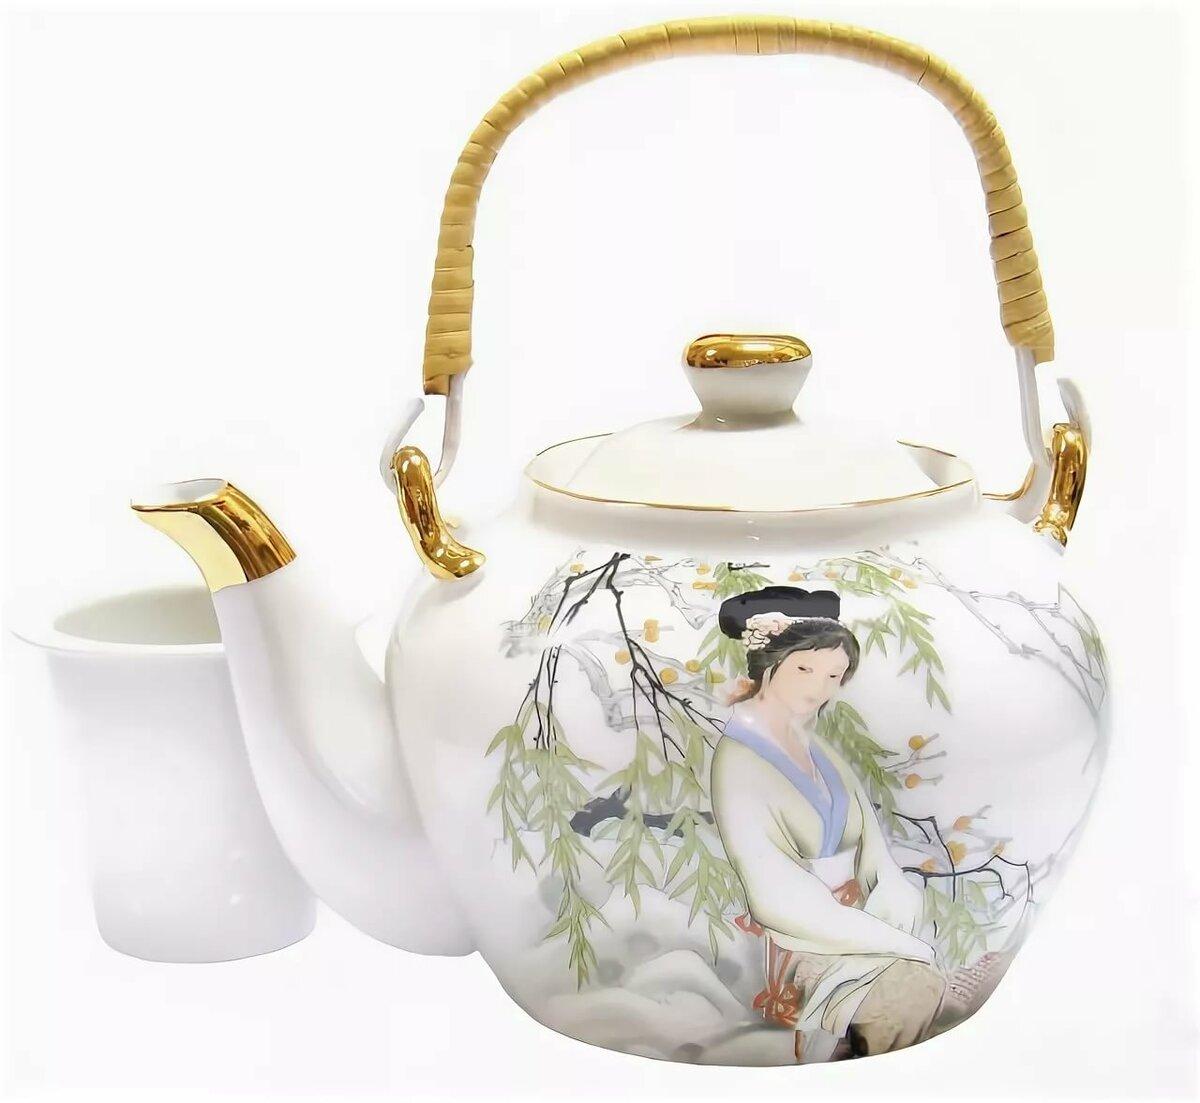 чайник из фарфора картинки места для